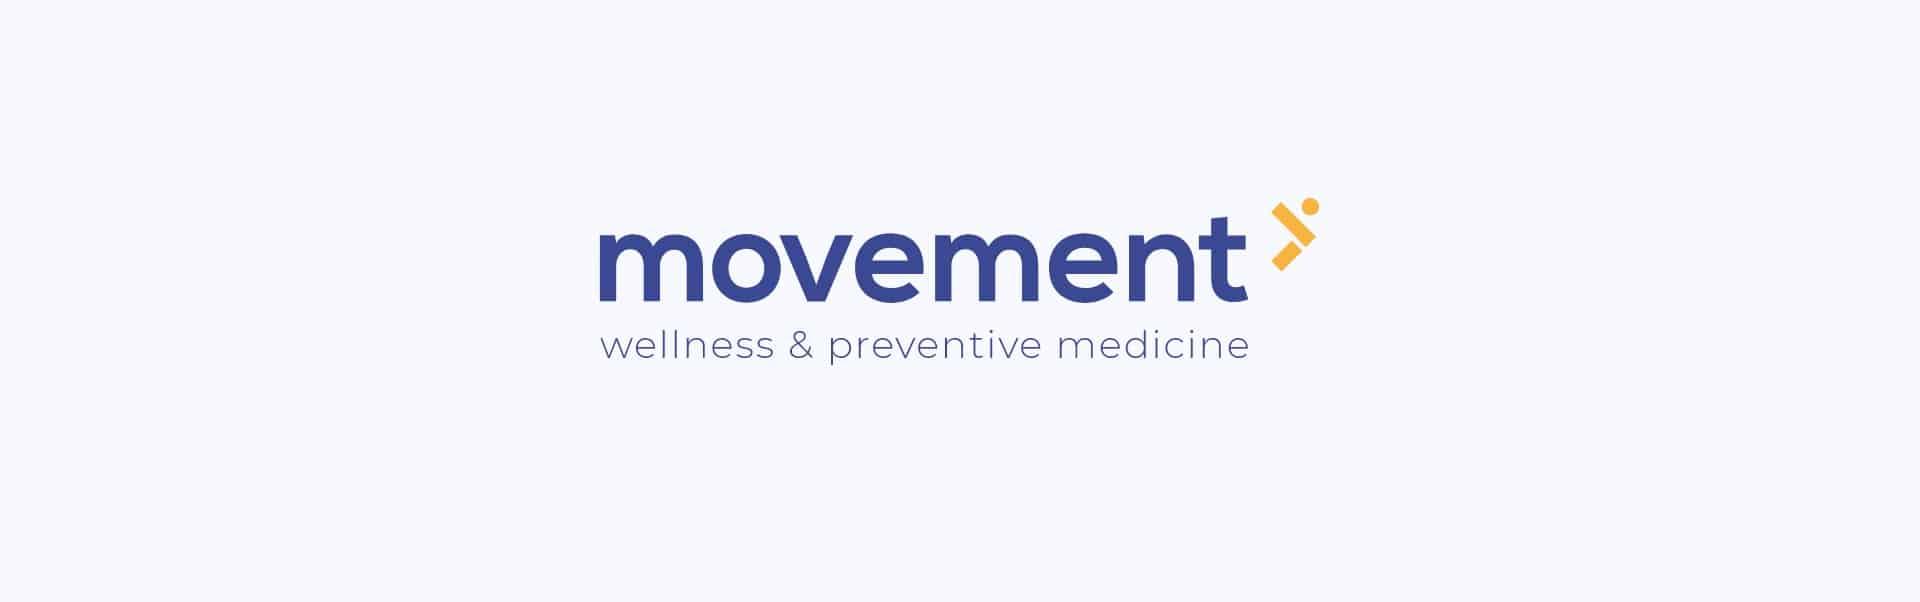 logo movement1